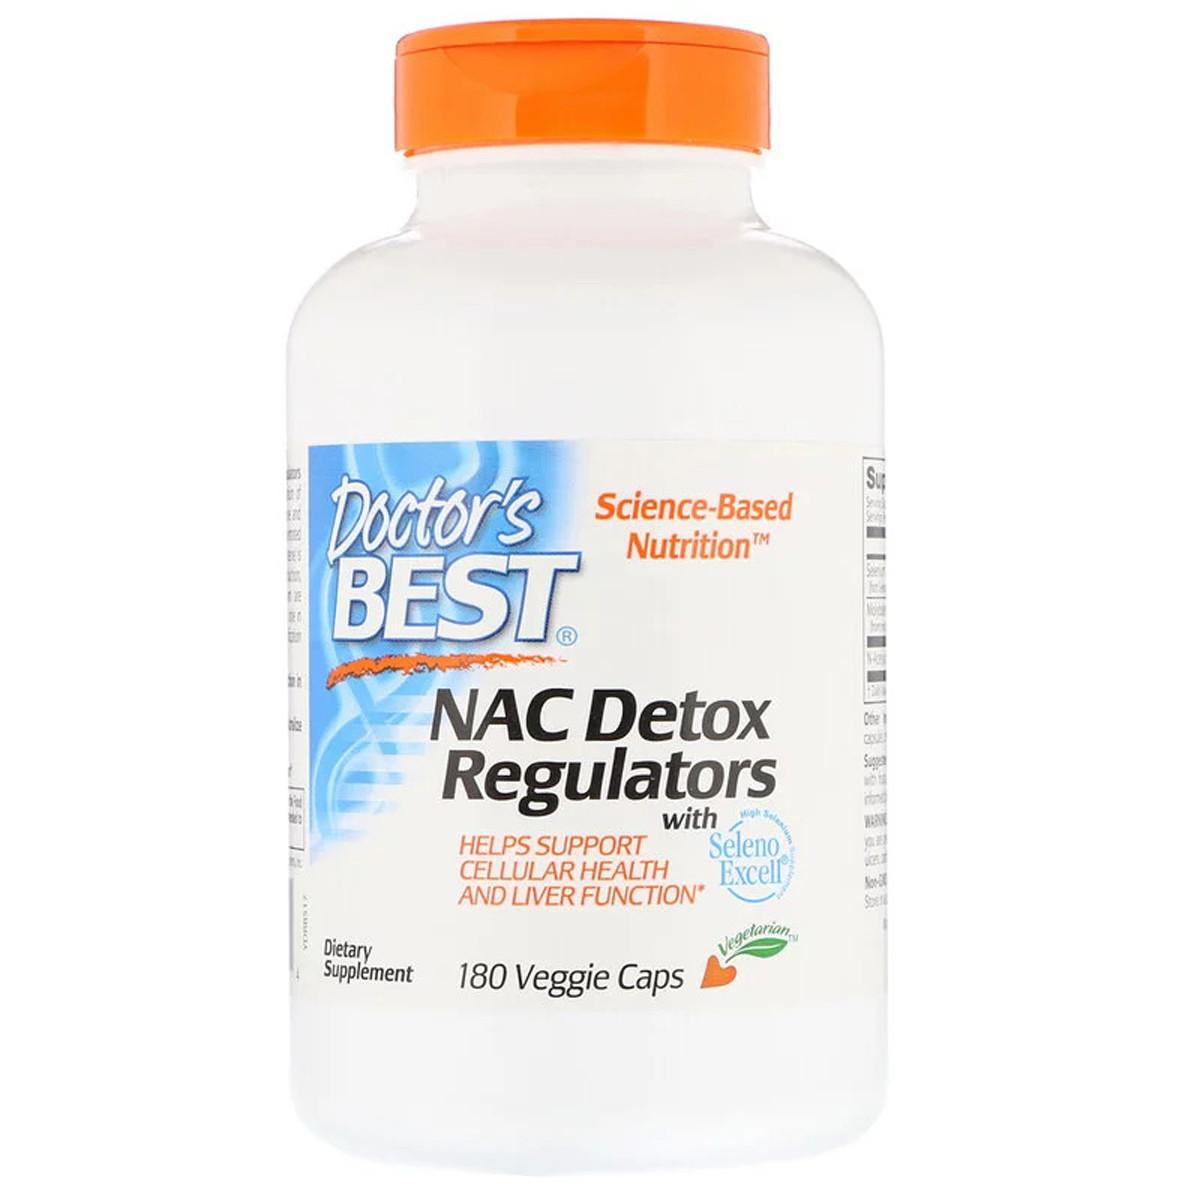 N-Ацетилцистеин, NAC Detox Regulators, Doctor's Best, 180 гелевых капсул